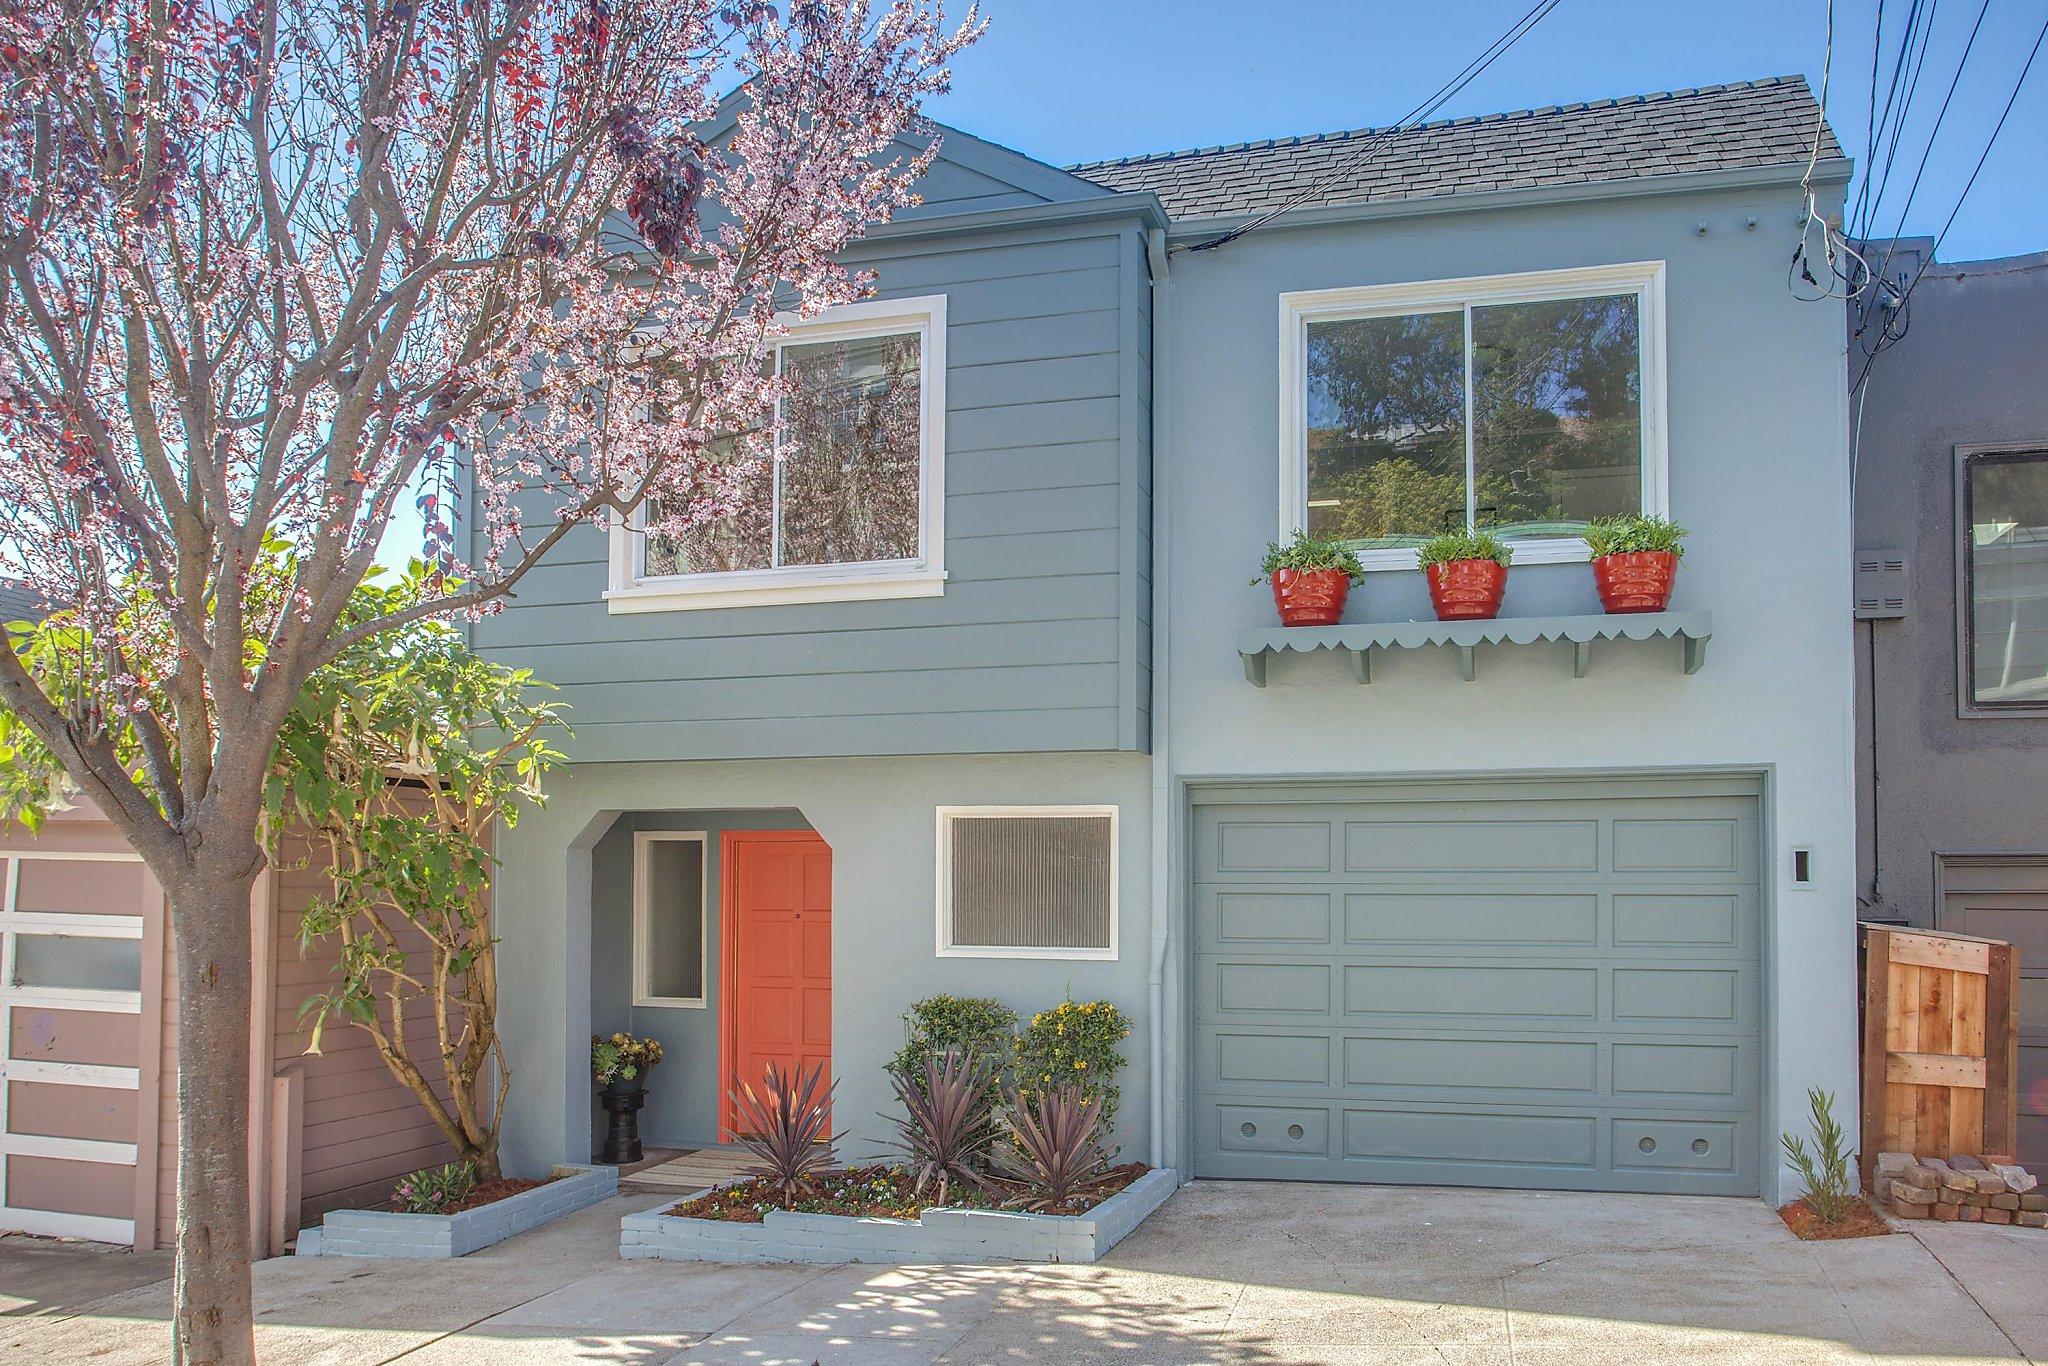 Hot Property: Mountain views highlight Glen Park home - SFGate